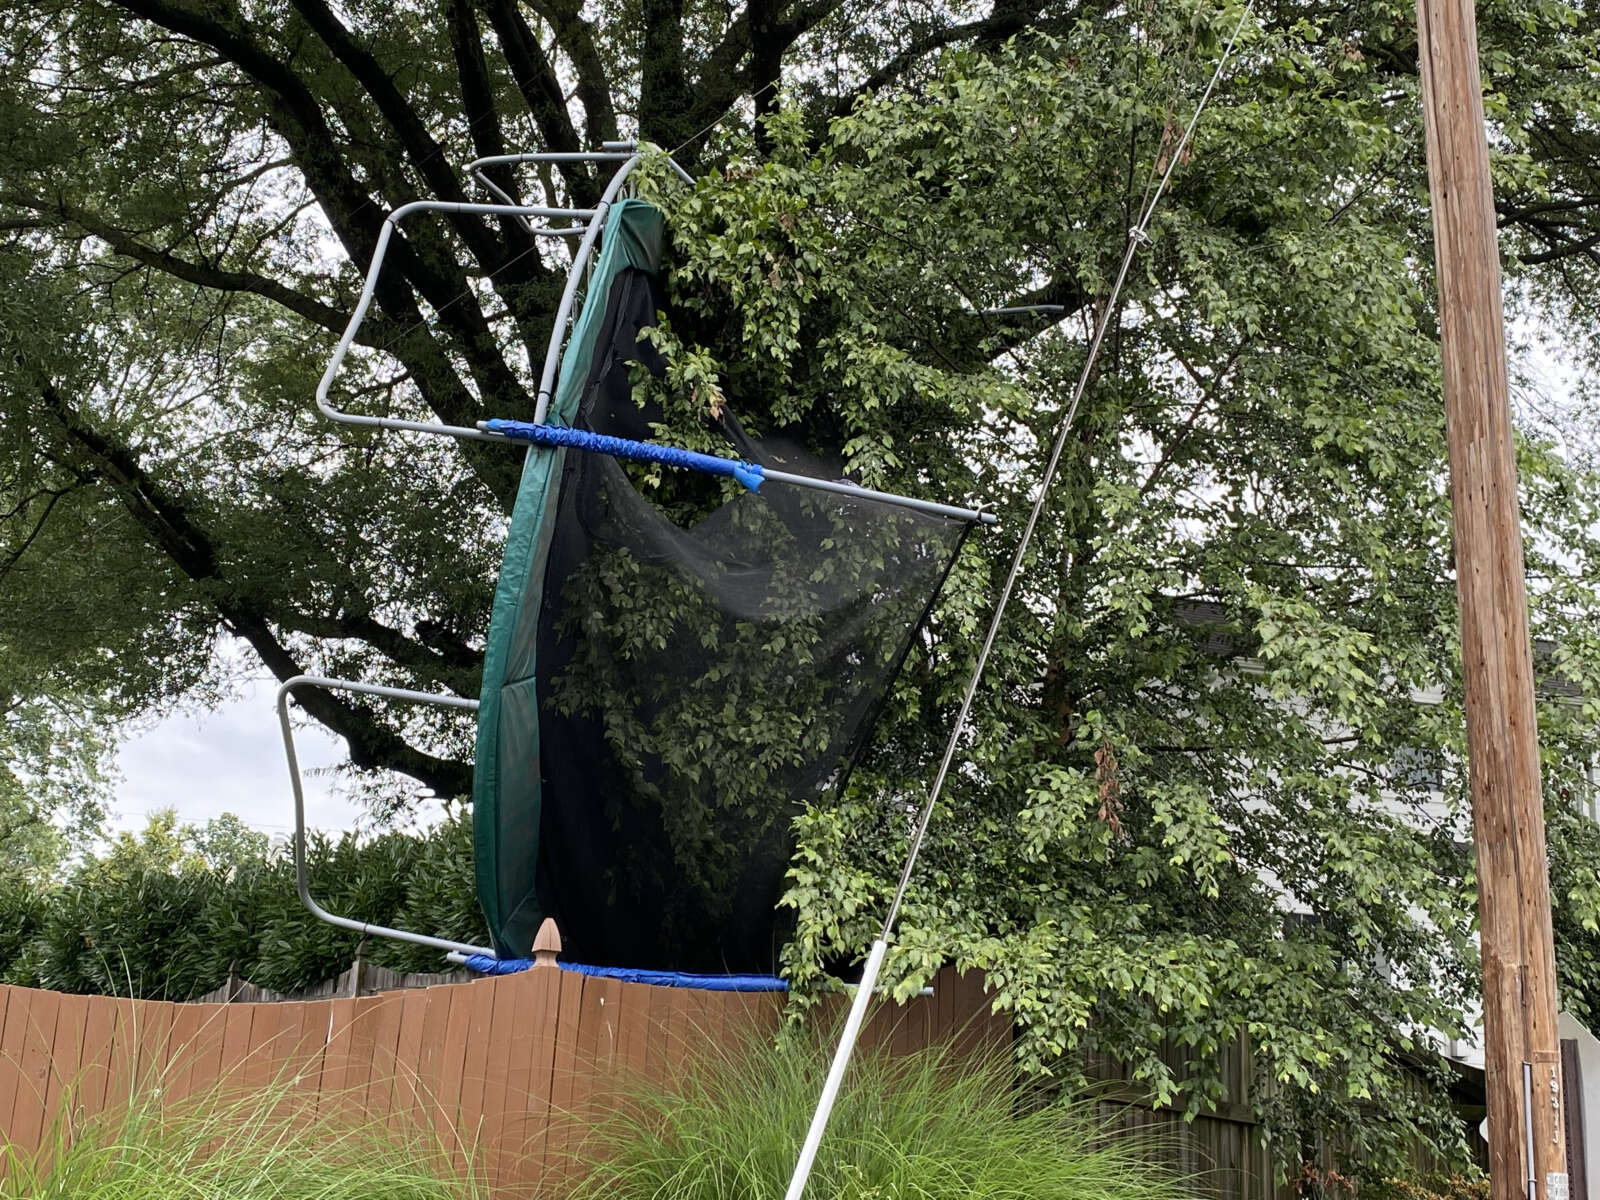 BREAKING: NWS Confirms Tornado Ripped Through North Arlington Neighborhoods